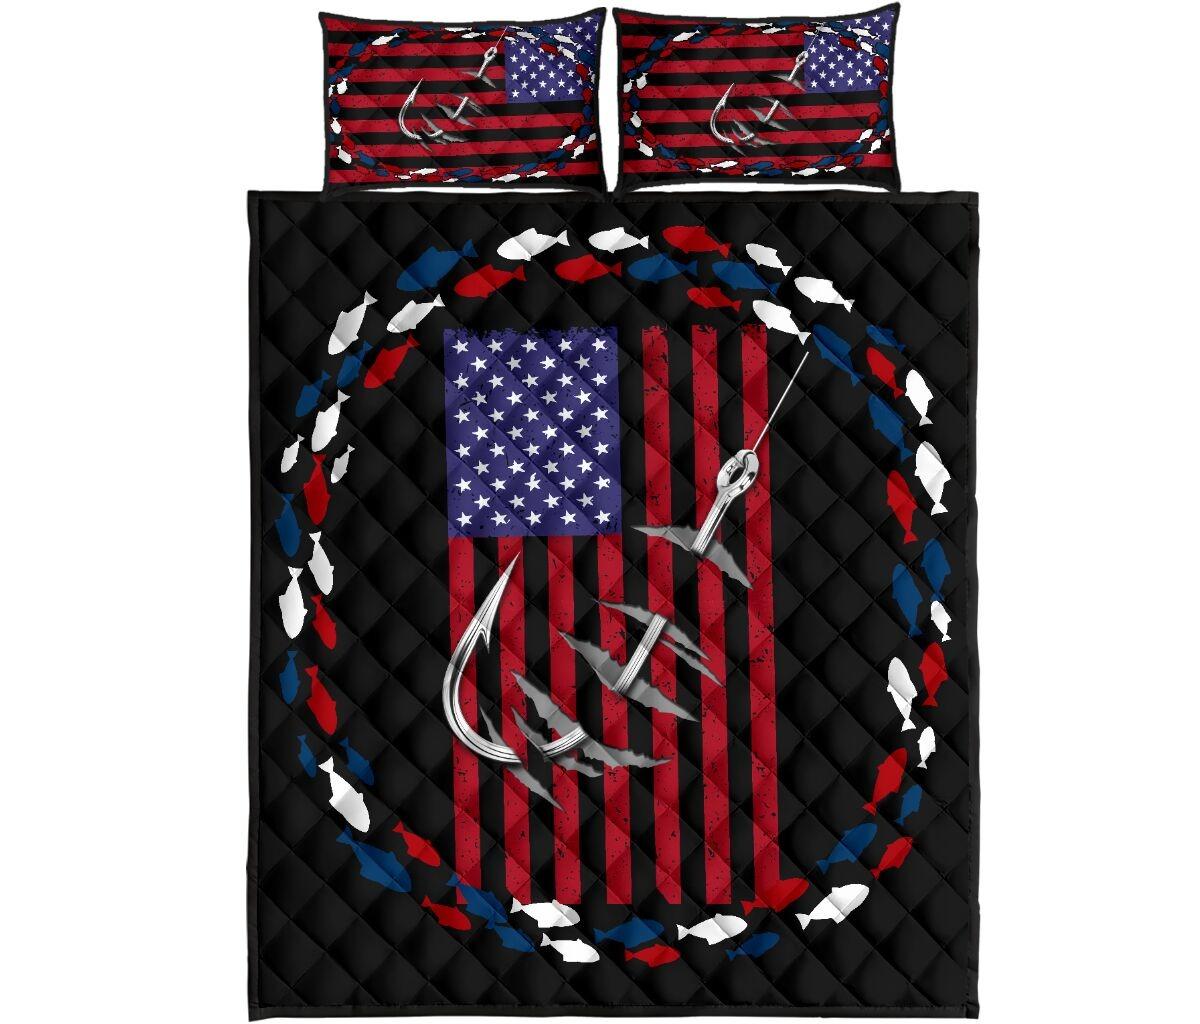 Fishing america quilt bedding set4